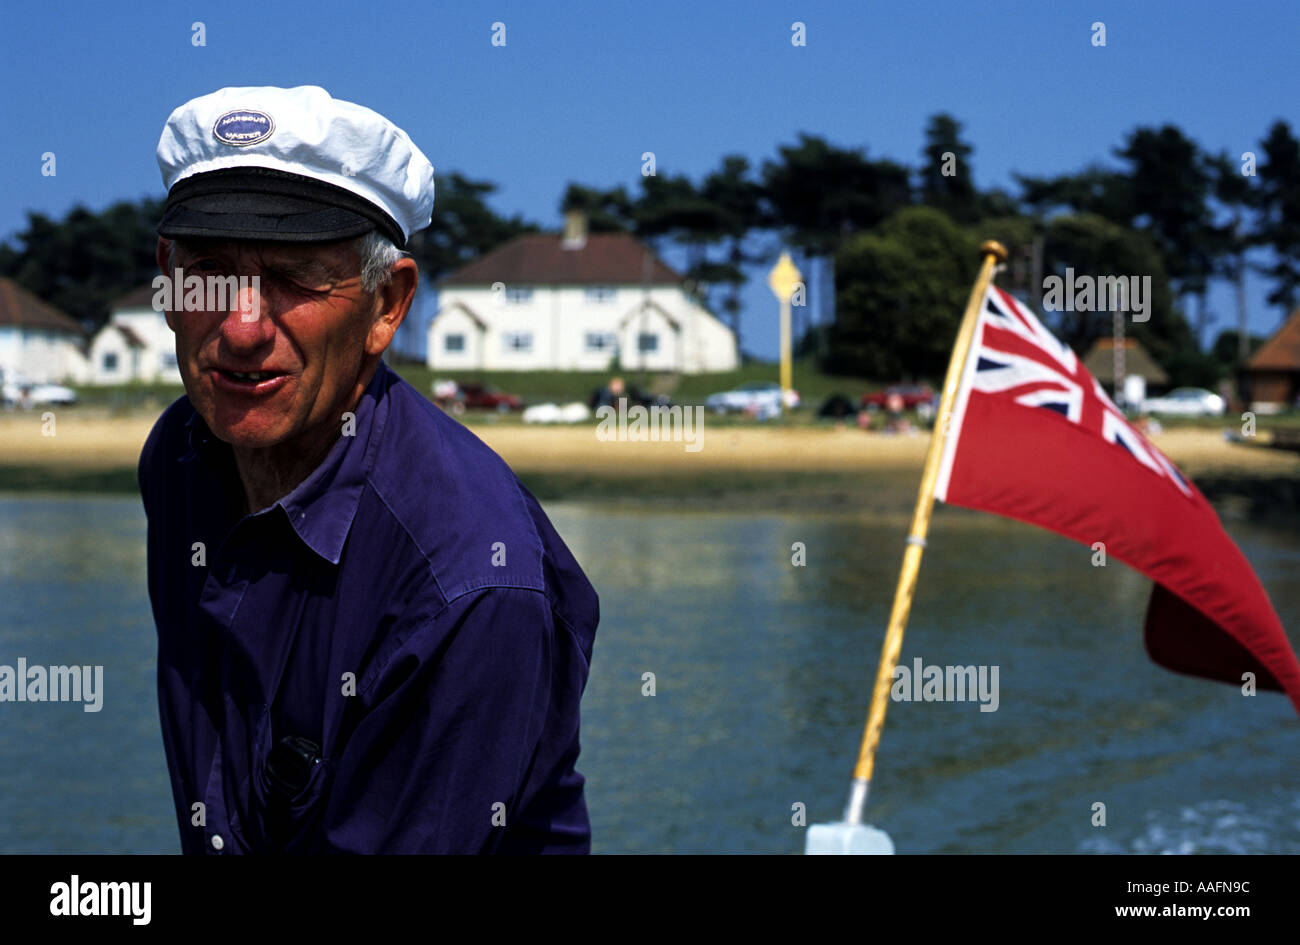 John White operating the Bawdsey to Felixstowe ferryboat on the river Deben, Suffolk, UK - Stock Image